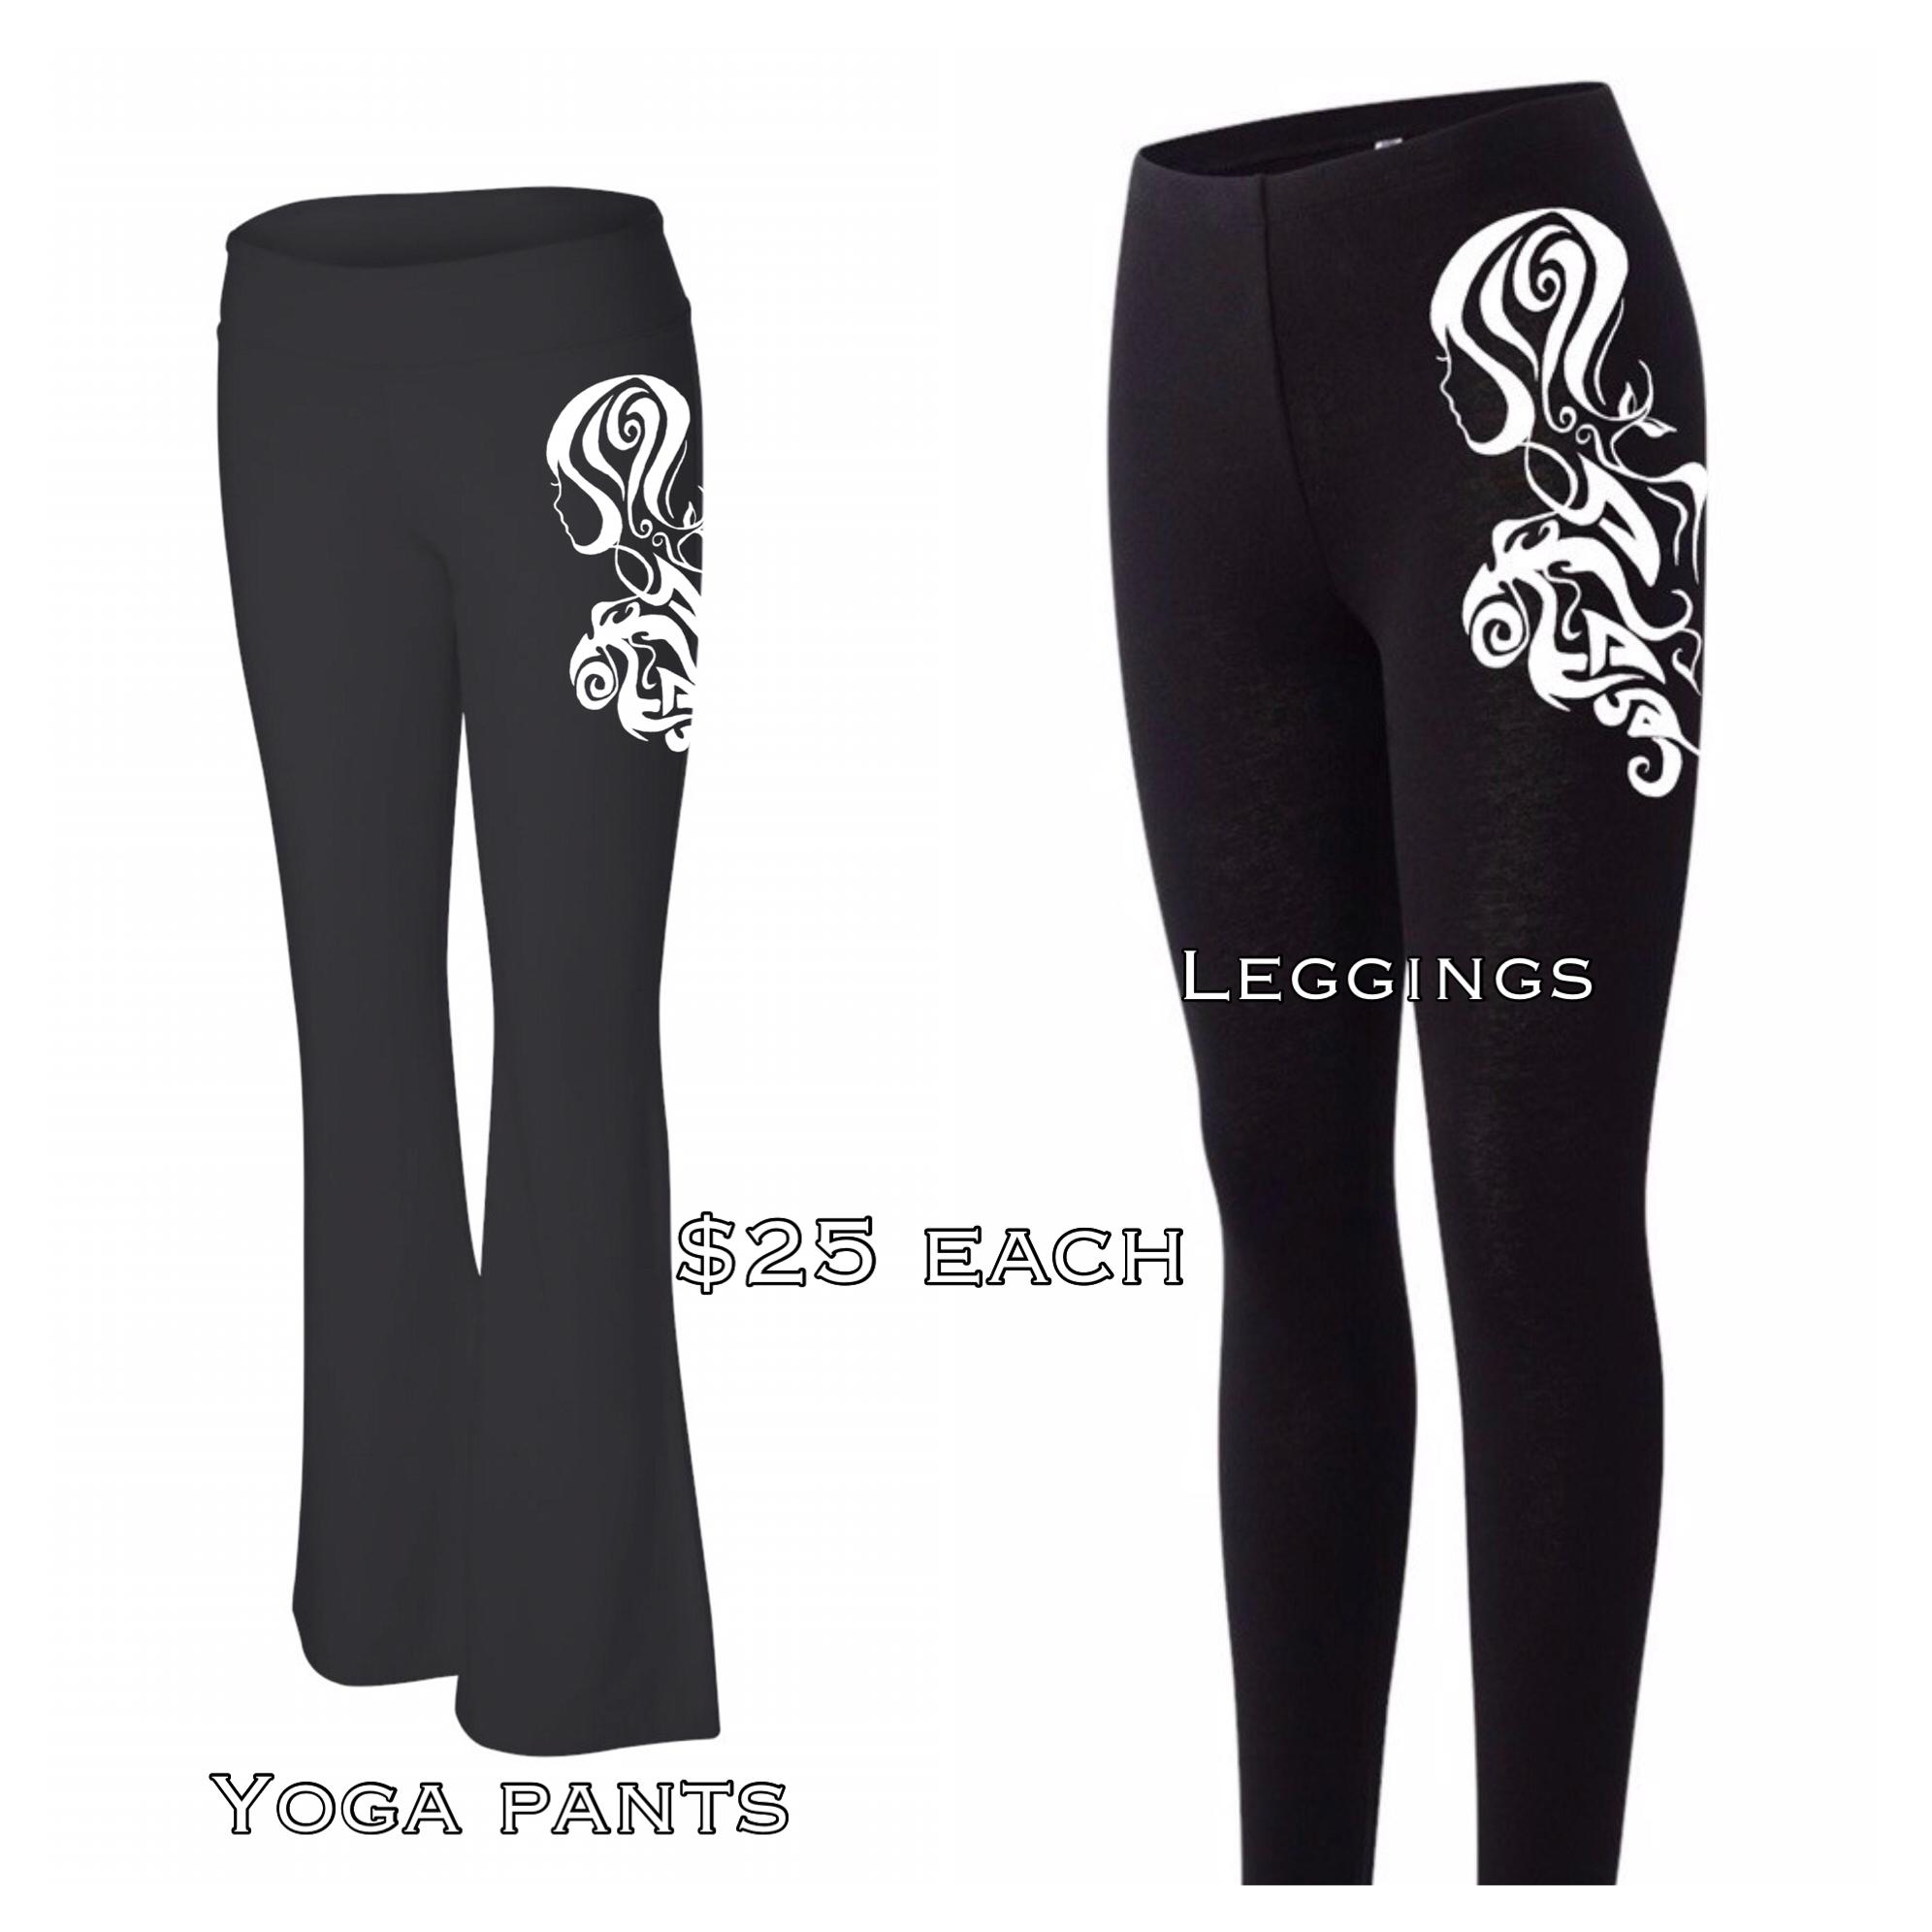 Yoga Pants and Leggings